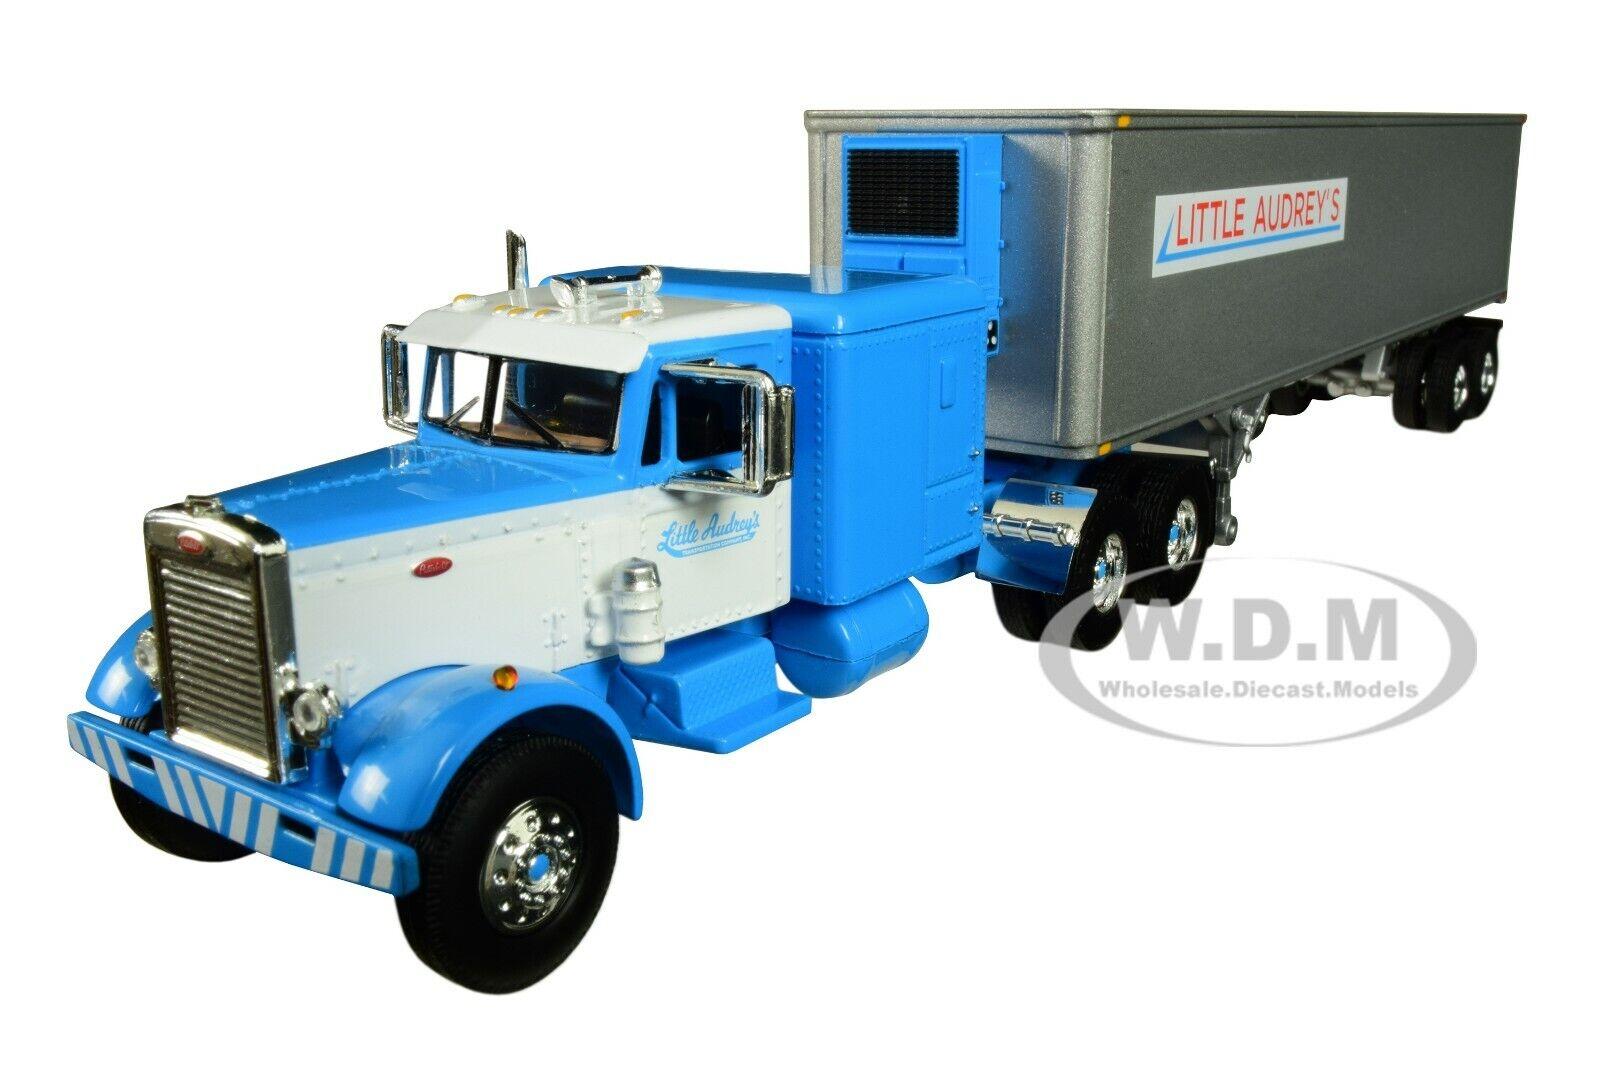 Peterbilt 351 63 Sleeper Bunk W 40 Reefer Trailer 1 64 By First Gear 60 0493 For Sale Online